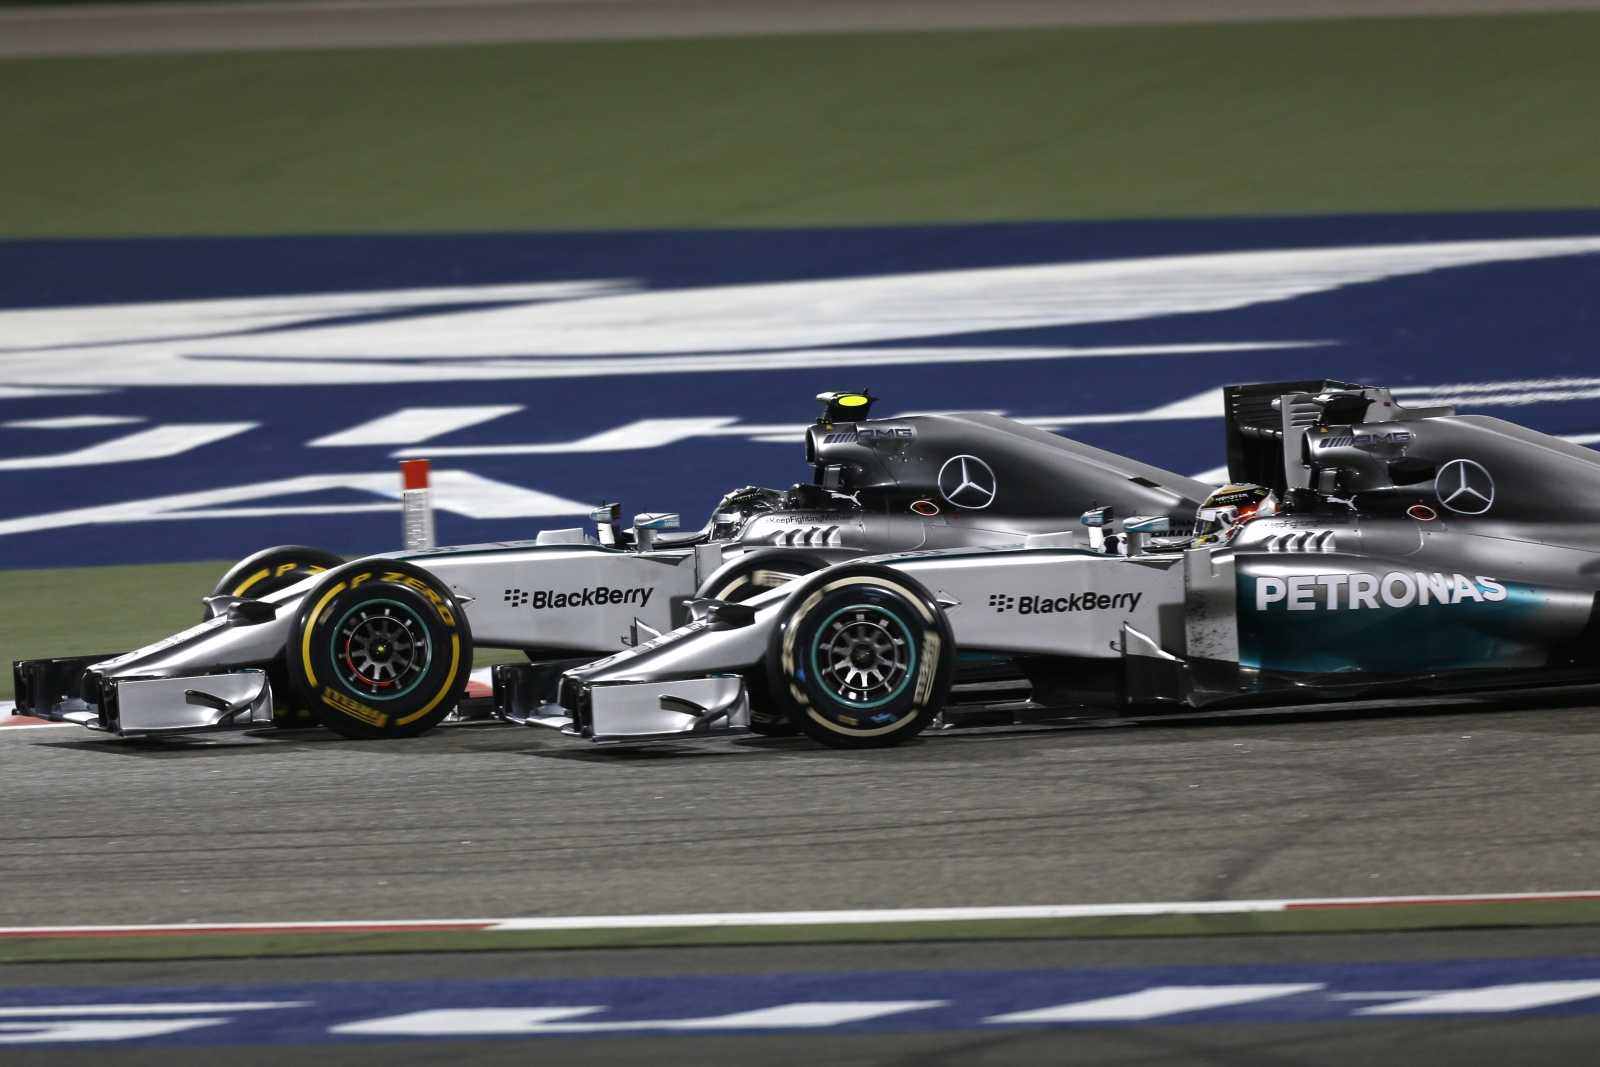 Mercedes AMG F1 cars